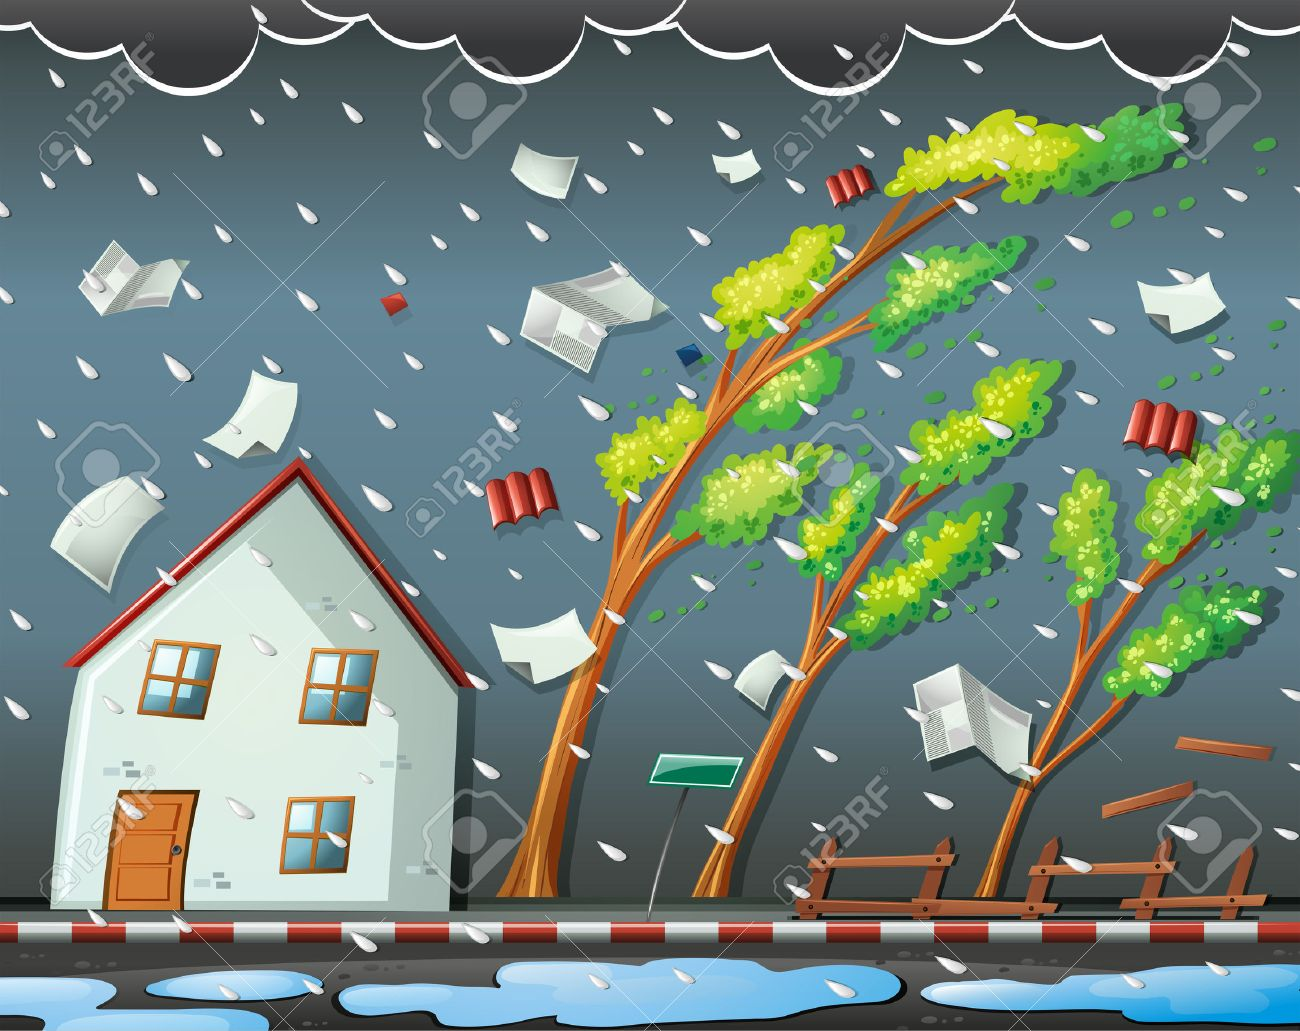 Natural disaster scene with hurricane illustration - 49135807